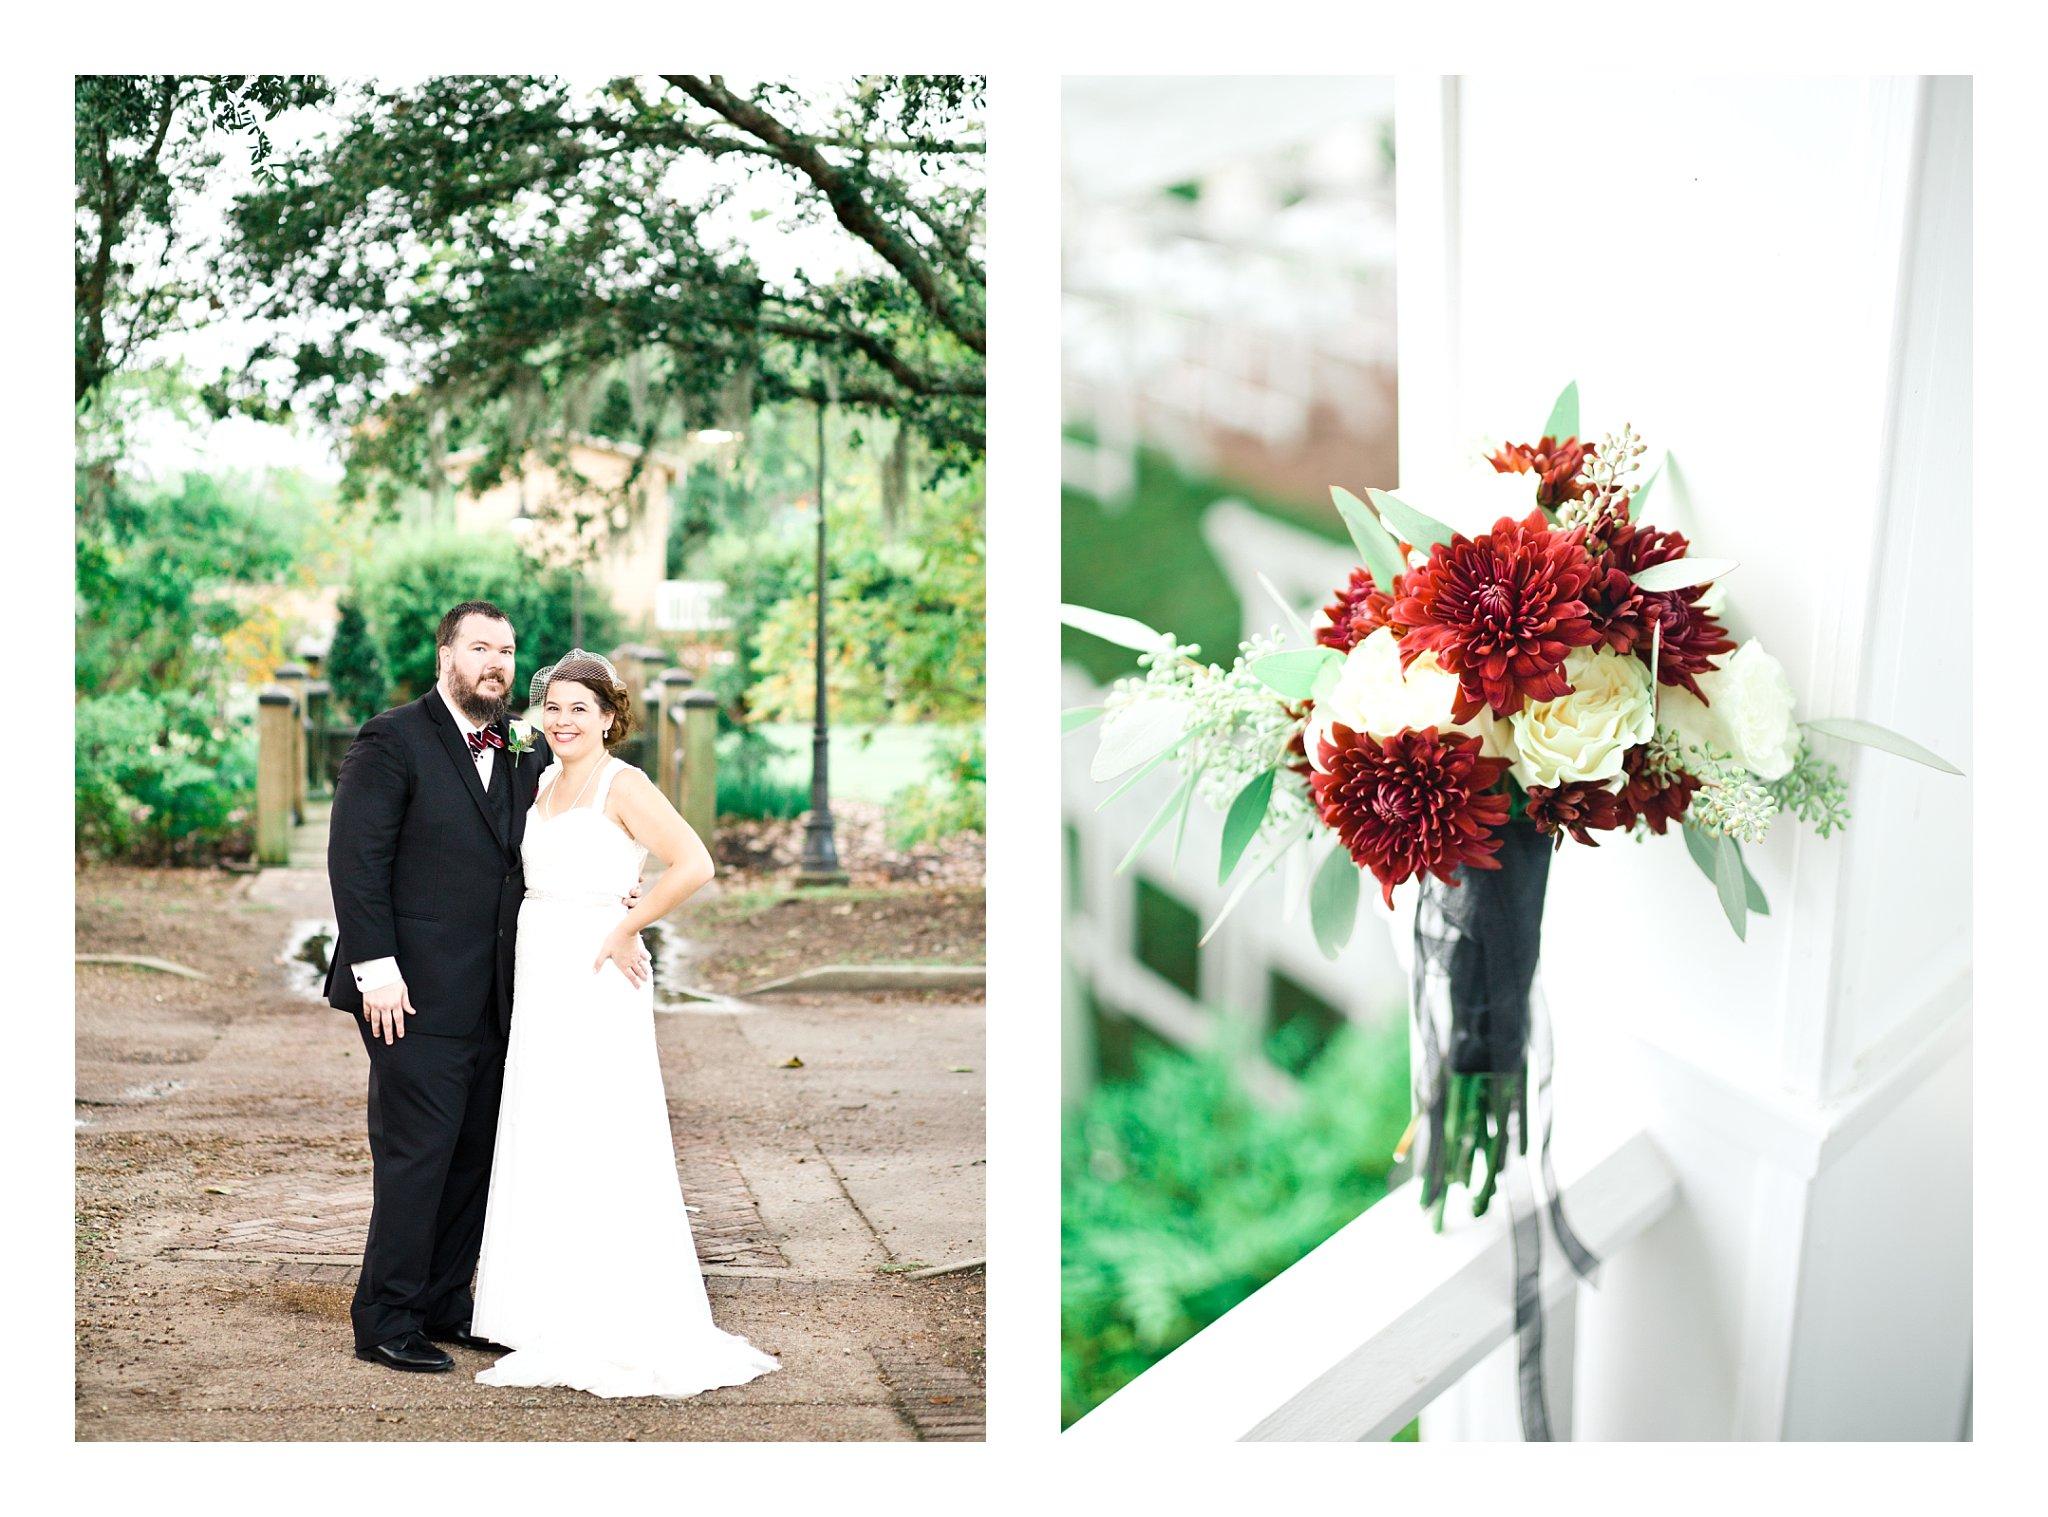 cypress-inn-garnet-black-lowcountry-vintage-wedding-conway-sc-photos_0147.jpg